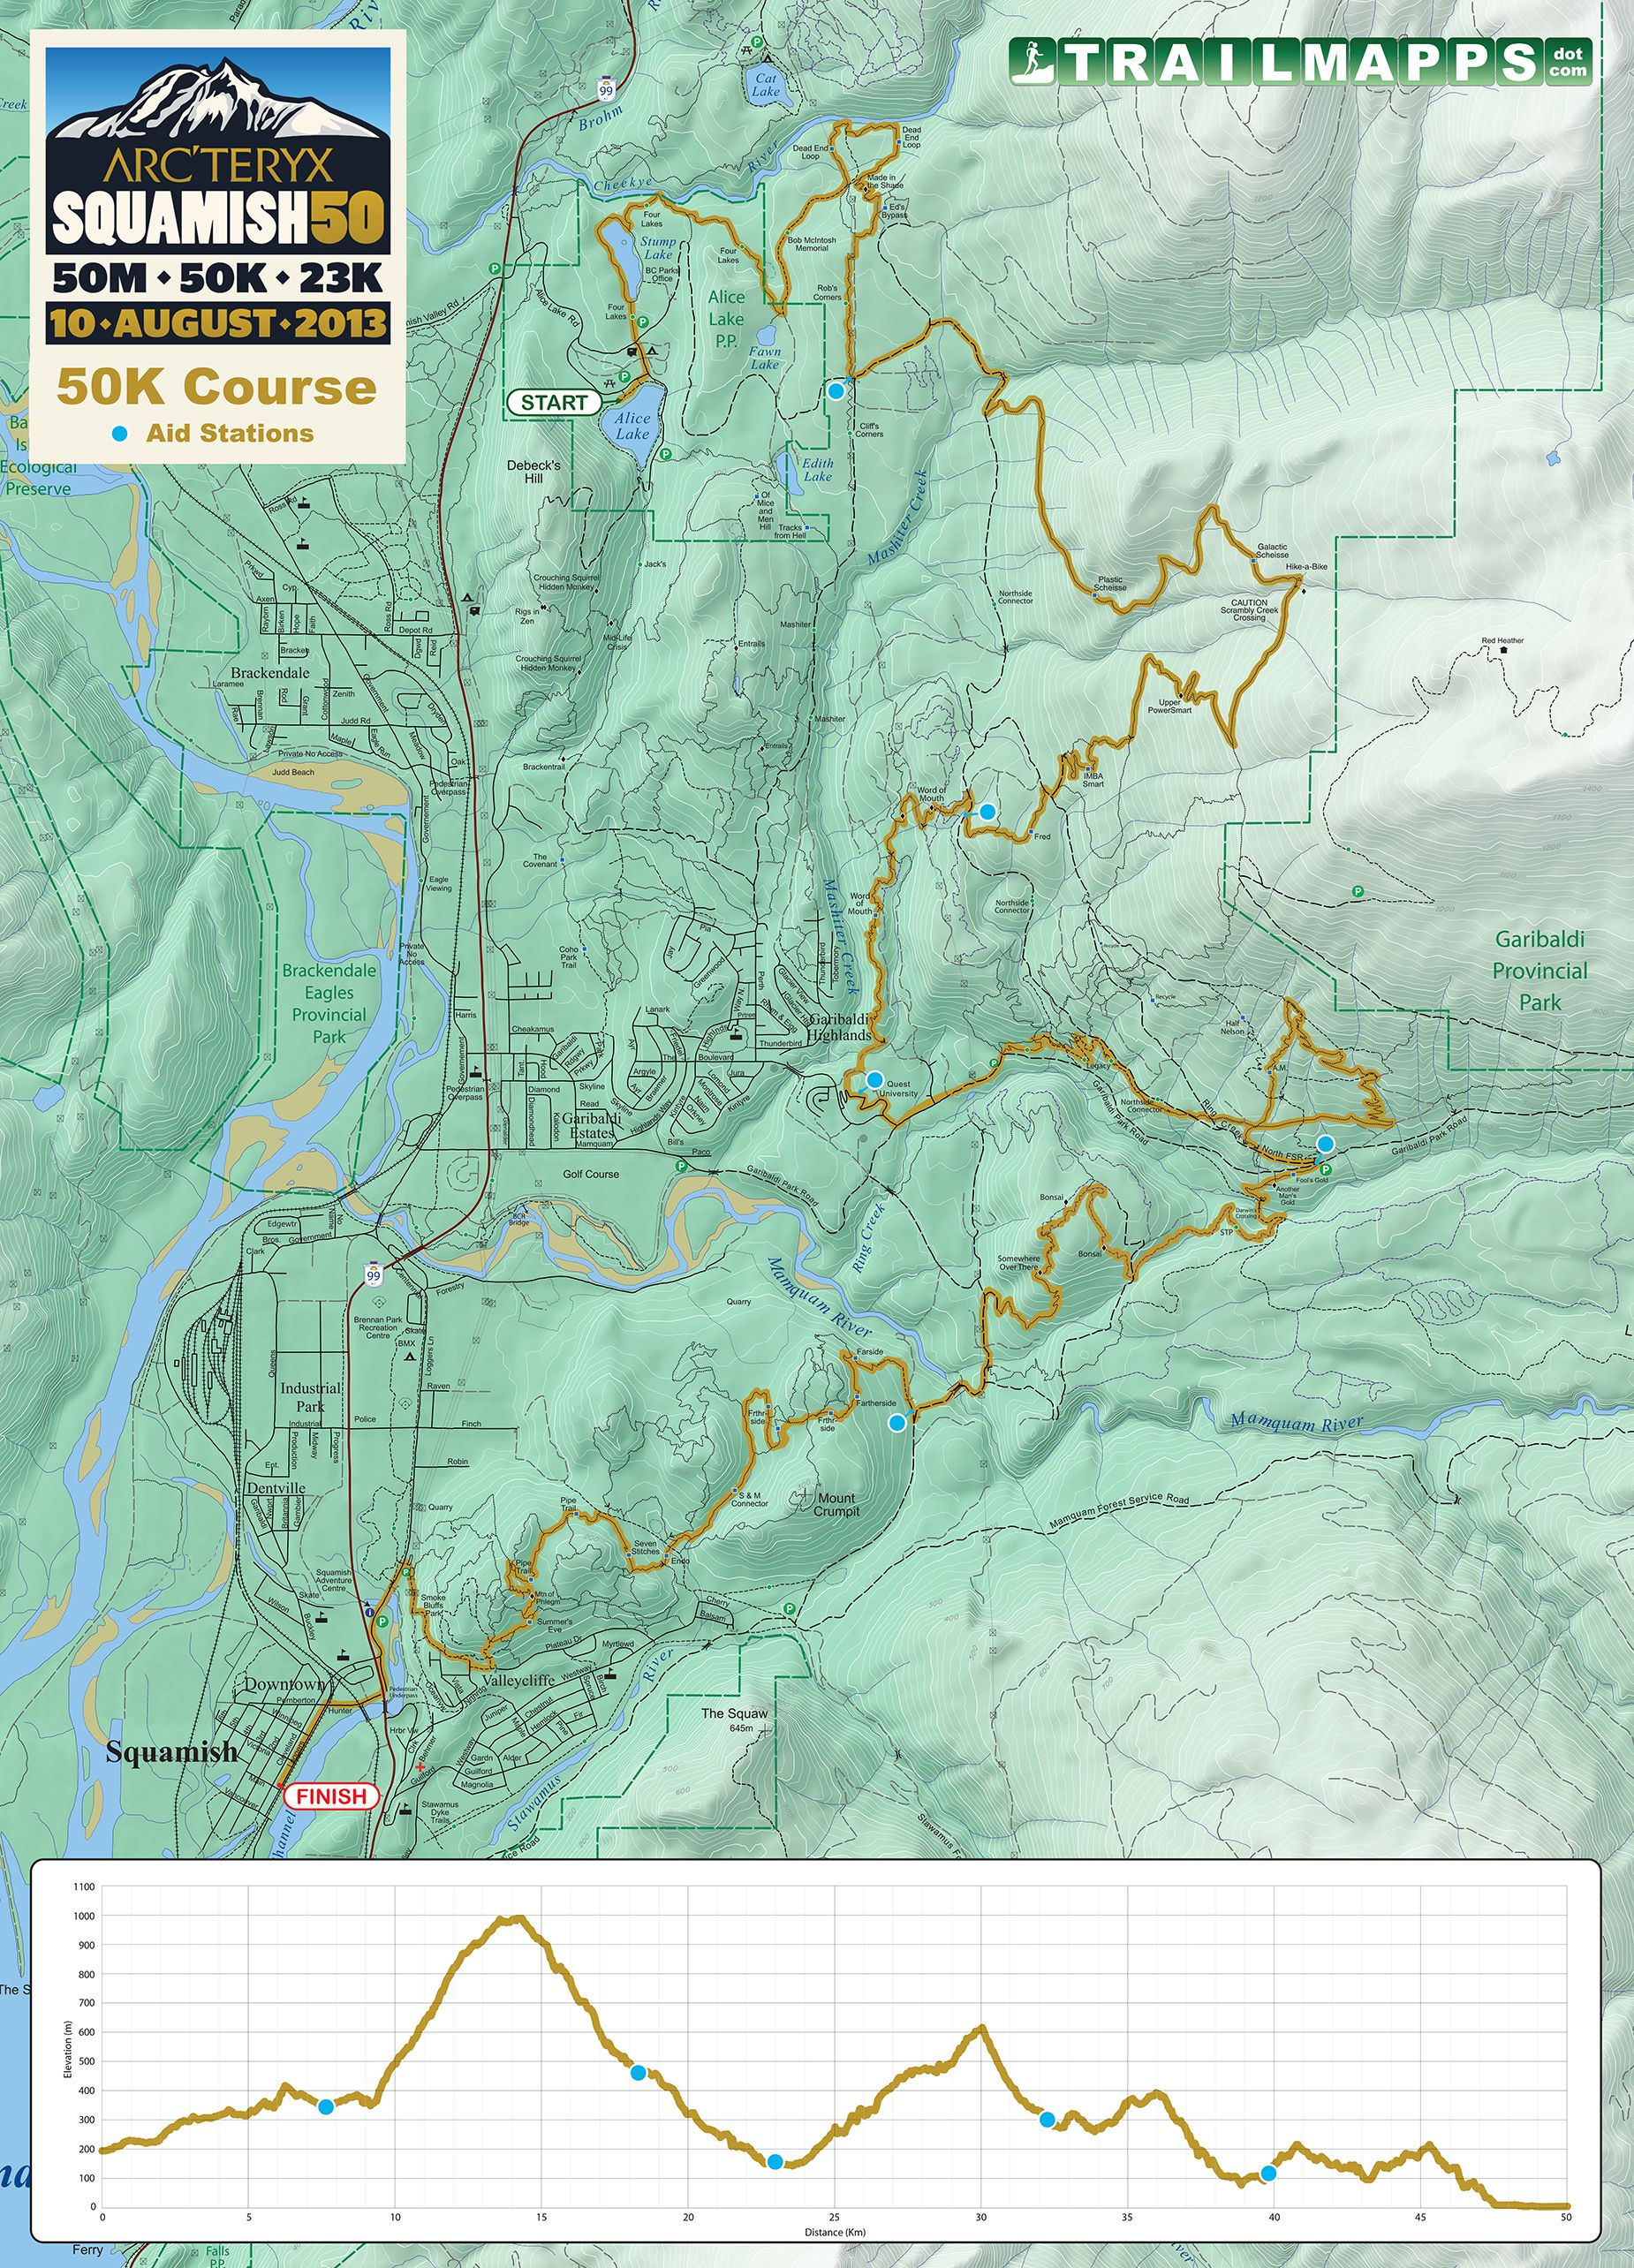 Squamish 50km trail map